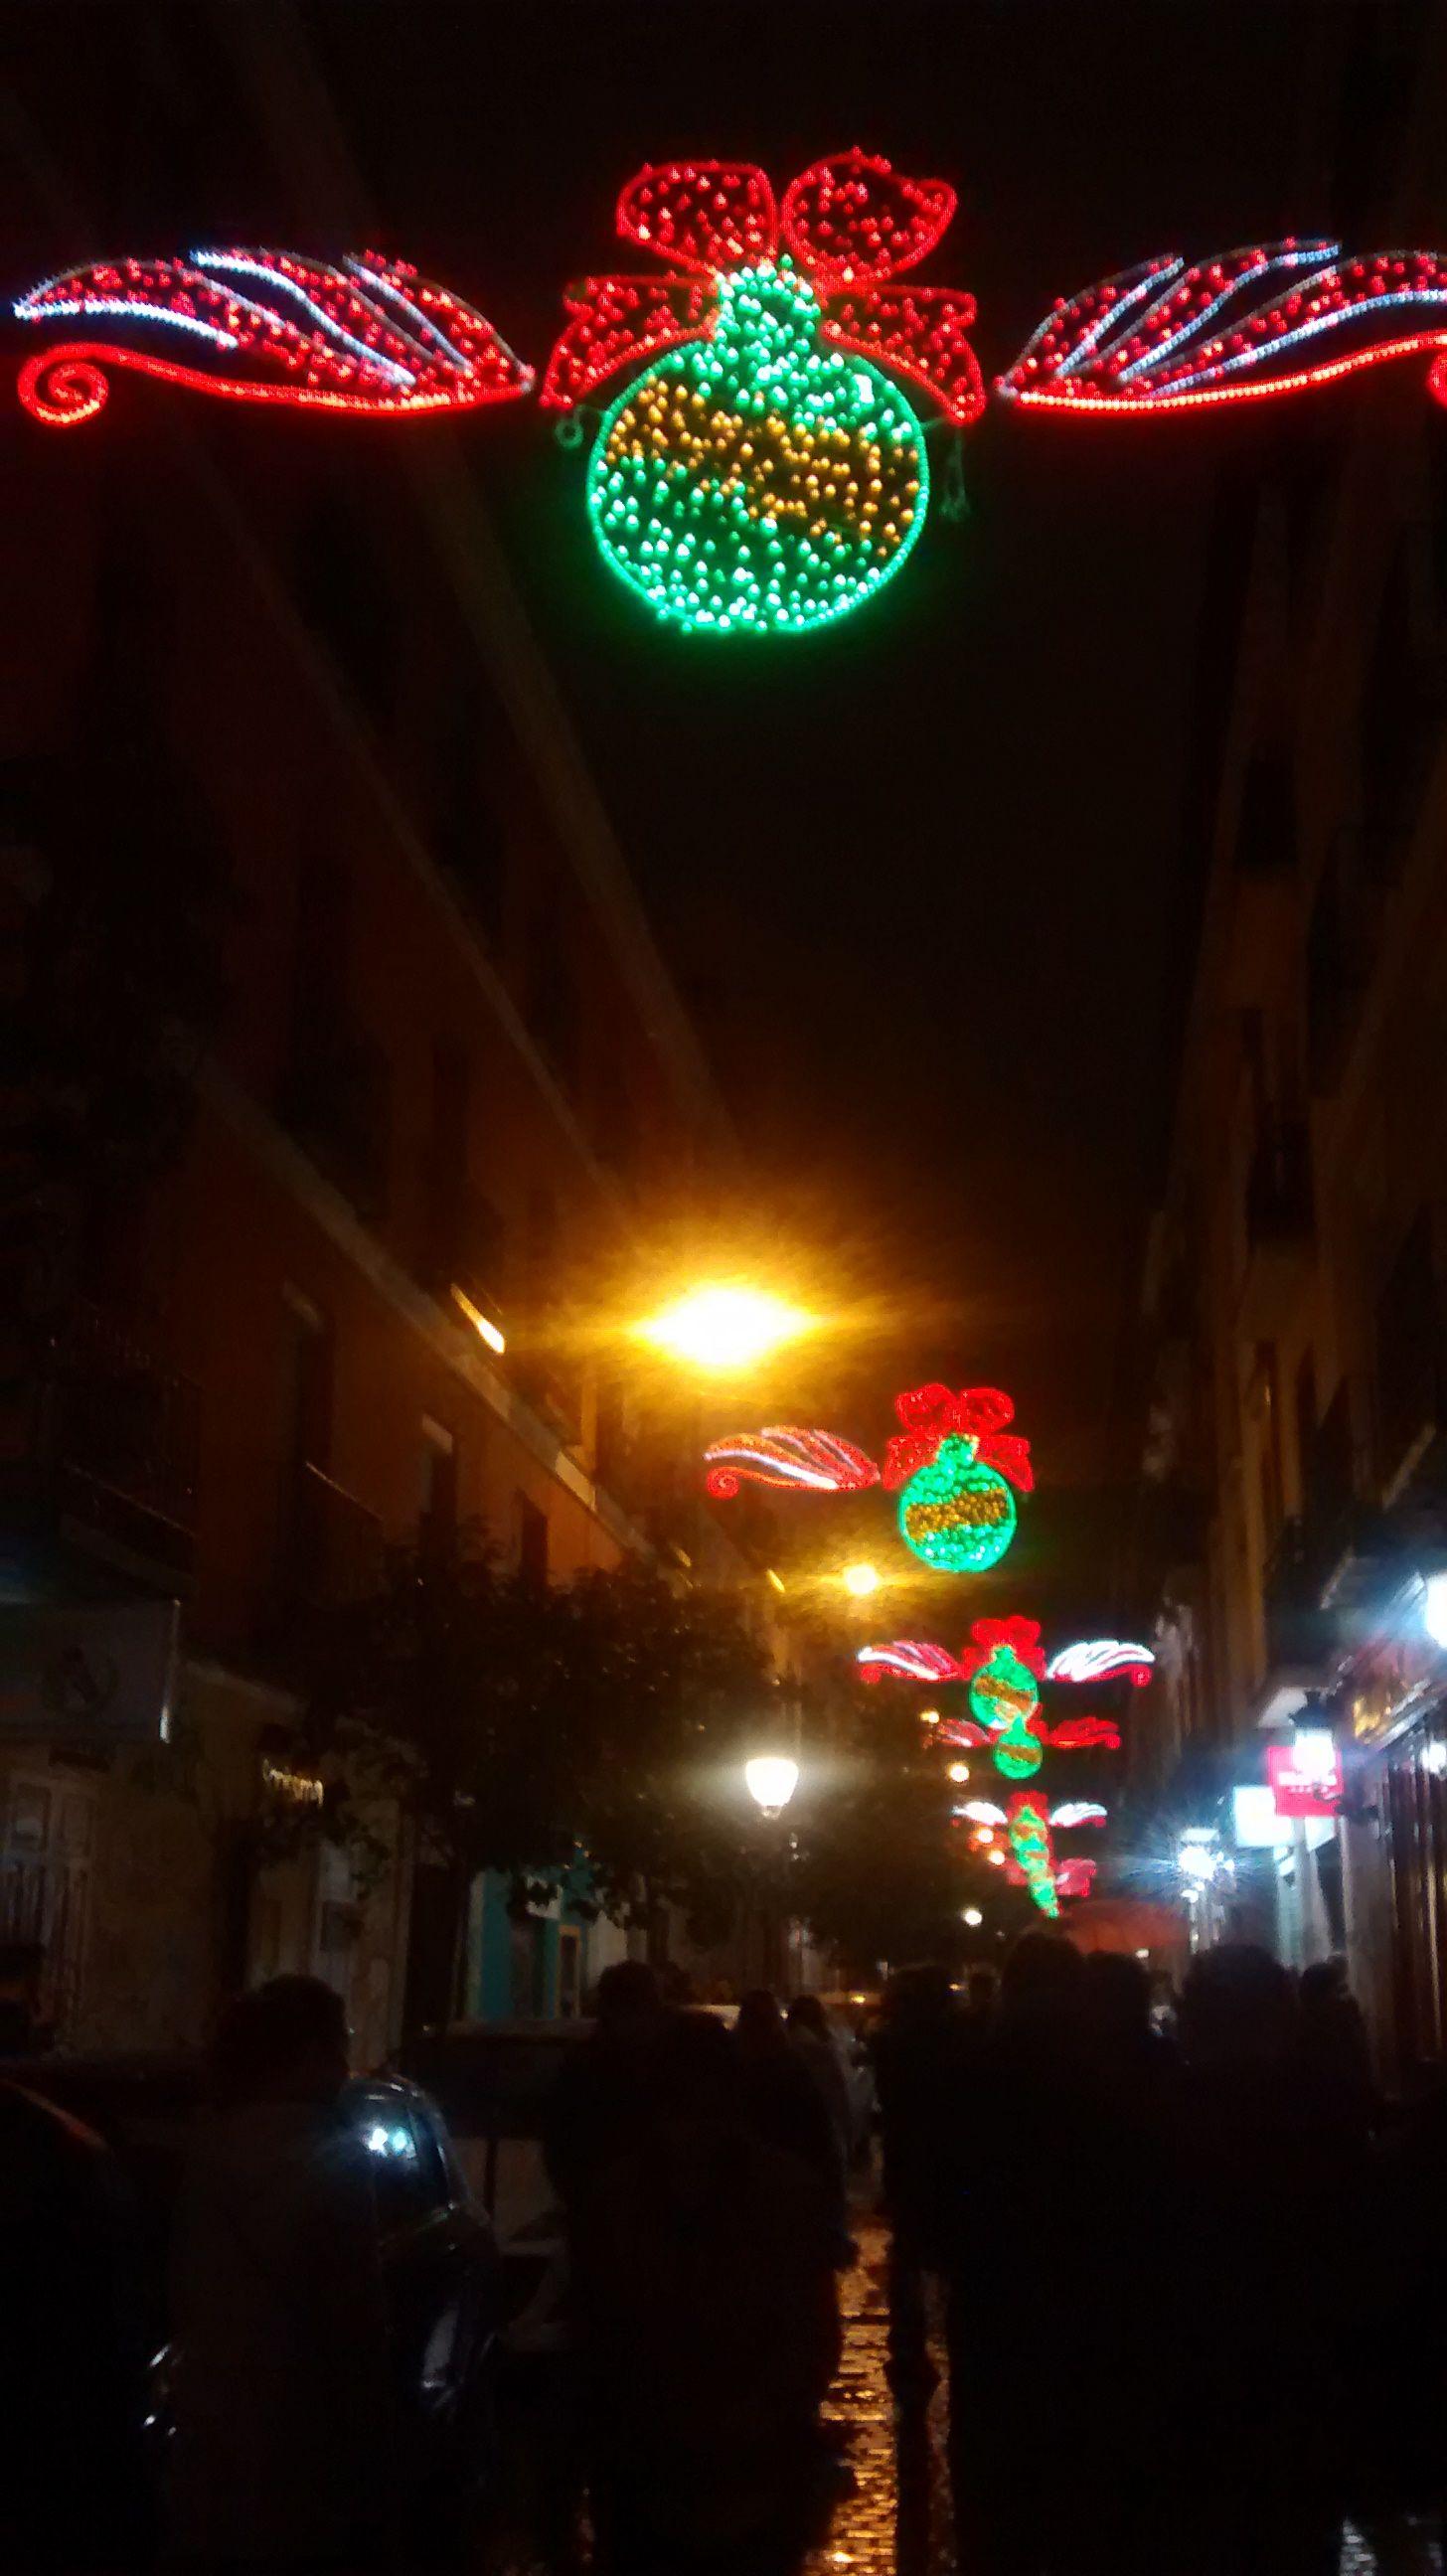 Luces de navidad de 2016 en San Vicente Ferrer | SOMOS MALASAÑA